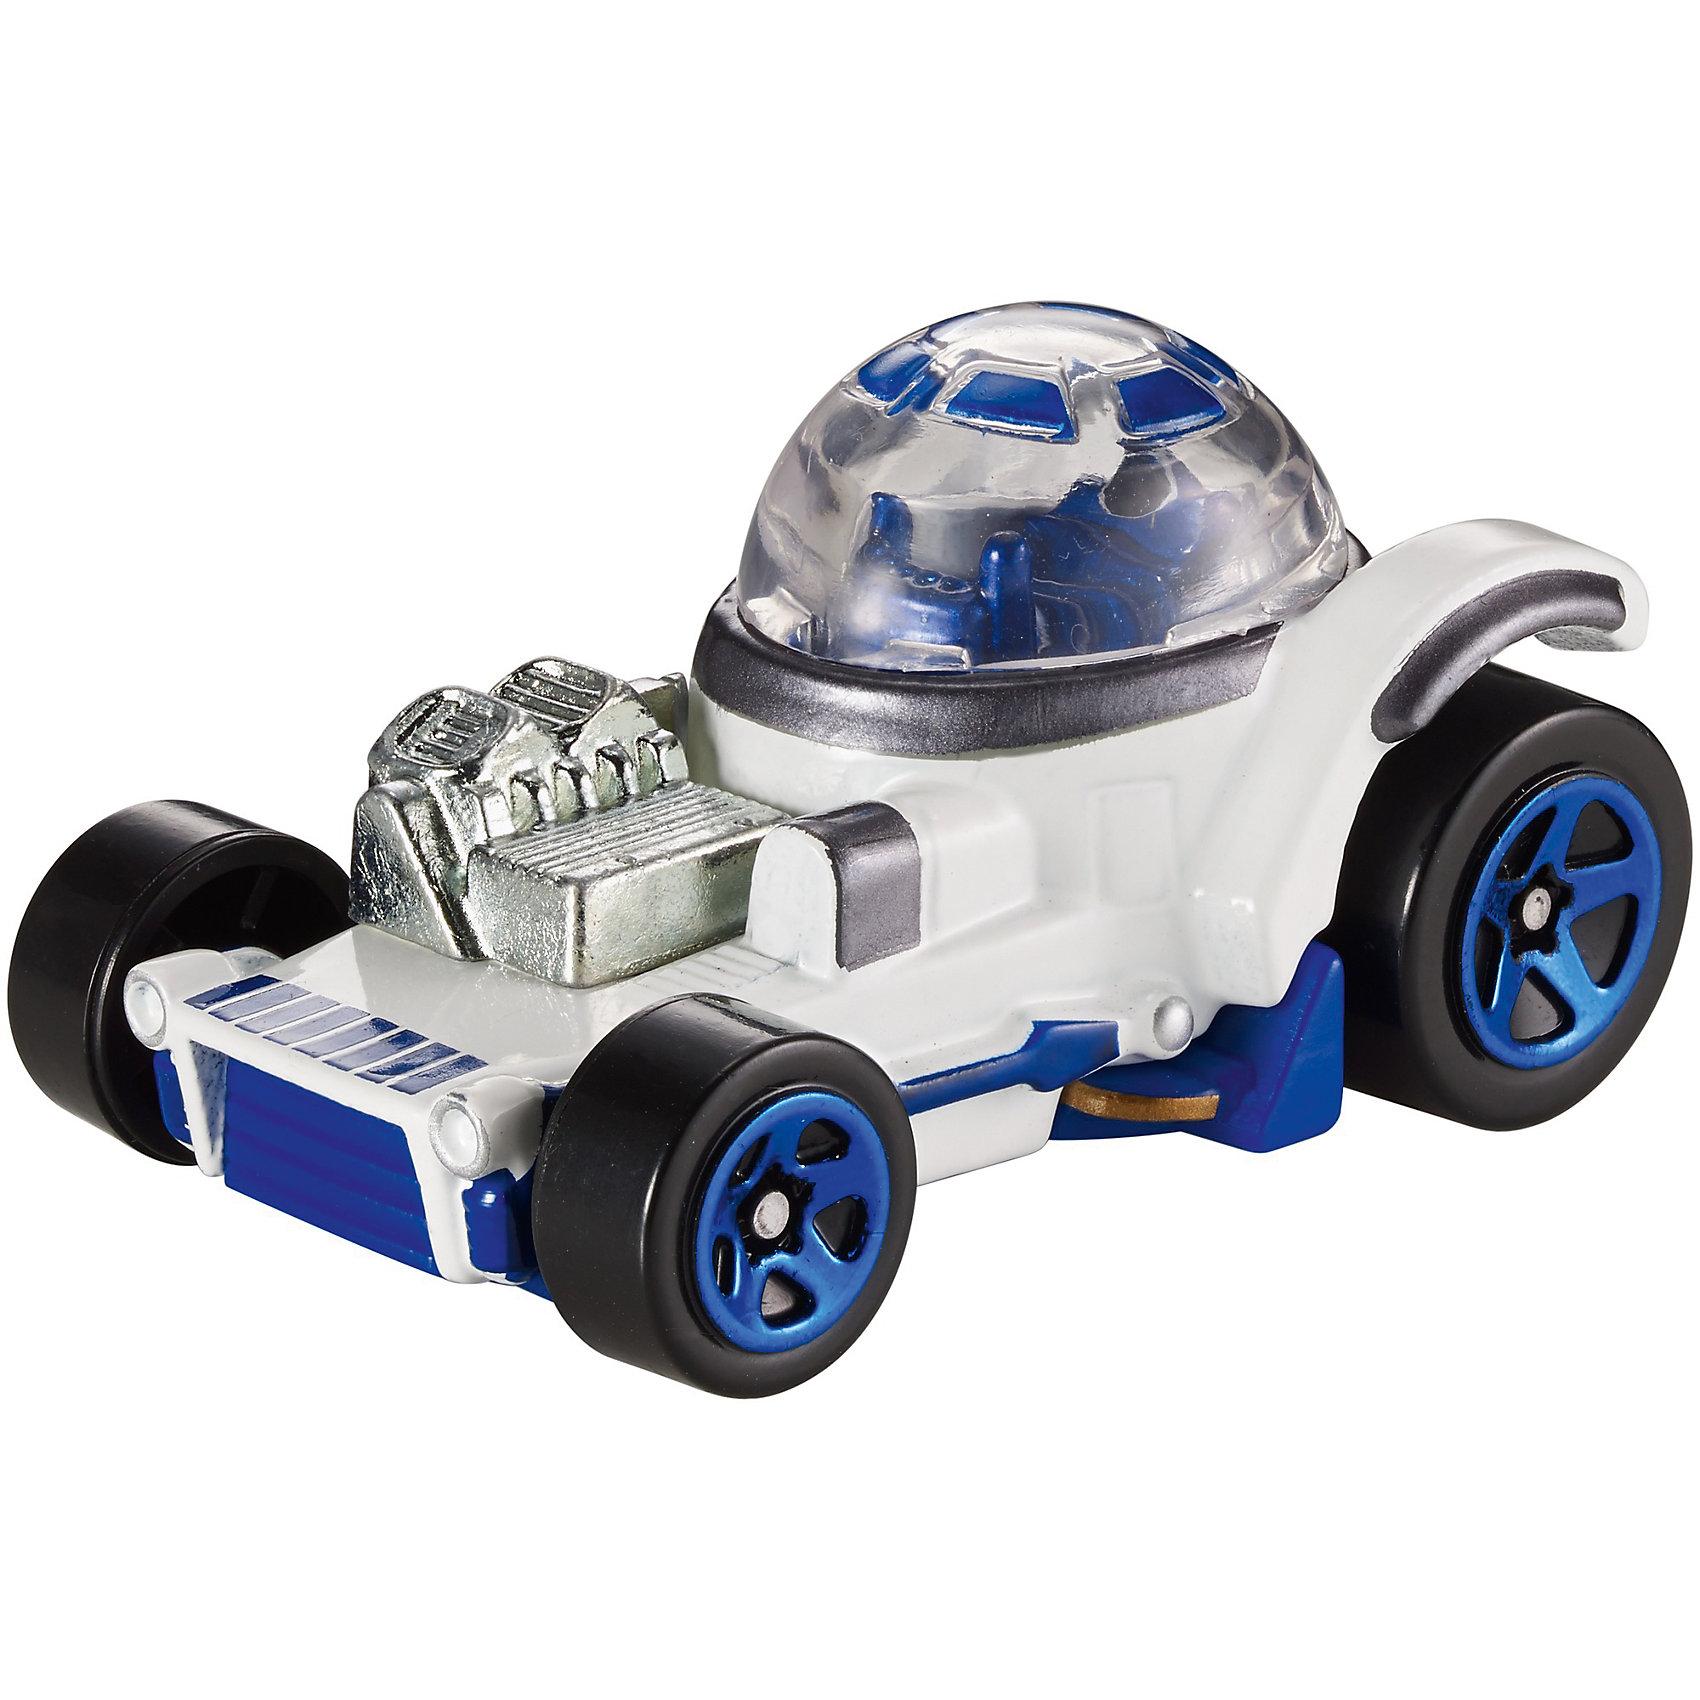 Машинка R2-D2 SW, Hot Wheels<br><br>Ширина мм: 140<br>Глубина мм: 40<br>Высота мм: 165<br>Вес г: 91<br>Возраст от месяцев: 36<br>Возраст до месяцев: 72<br>Пол: Мужской<br>Возраст: Детский<br>SKU: 5440264